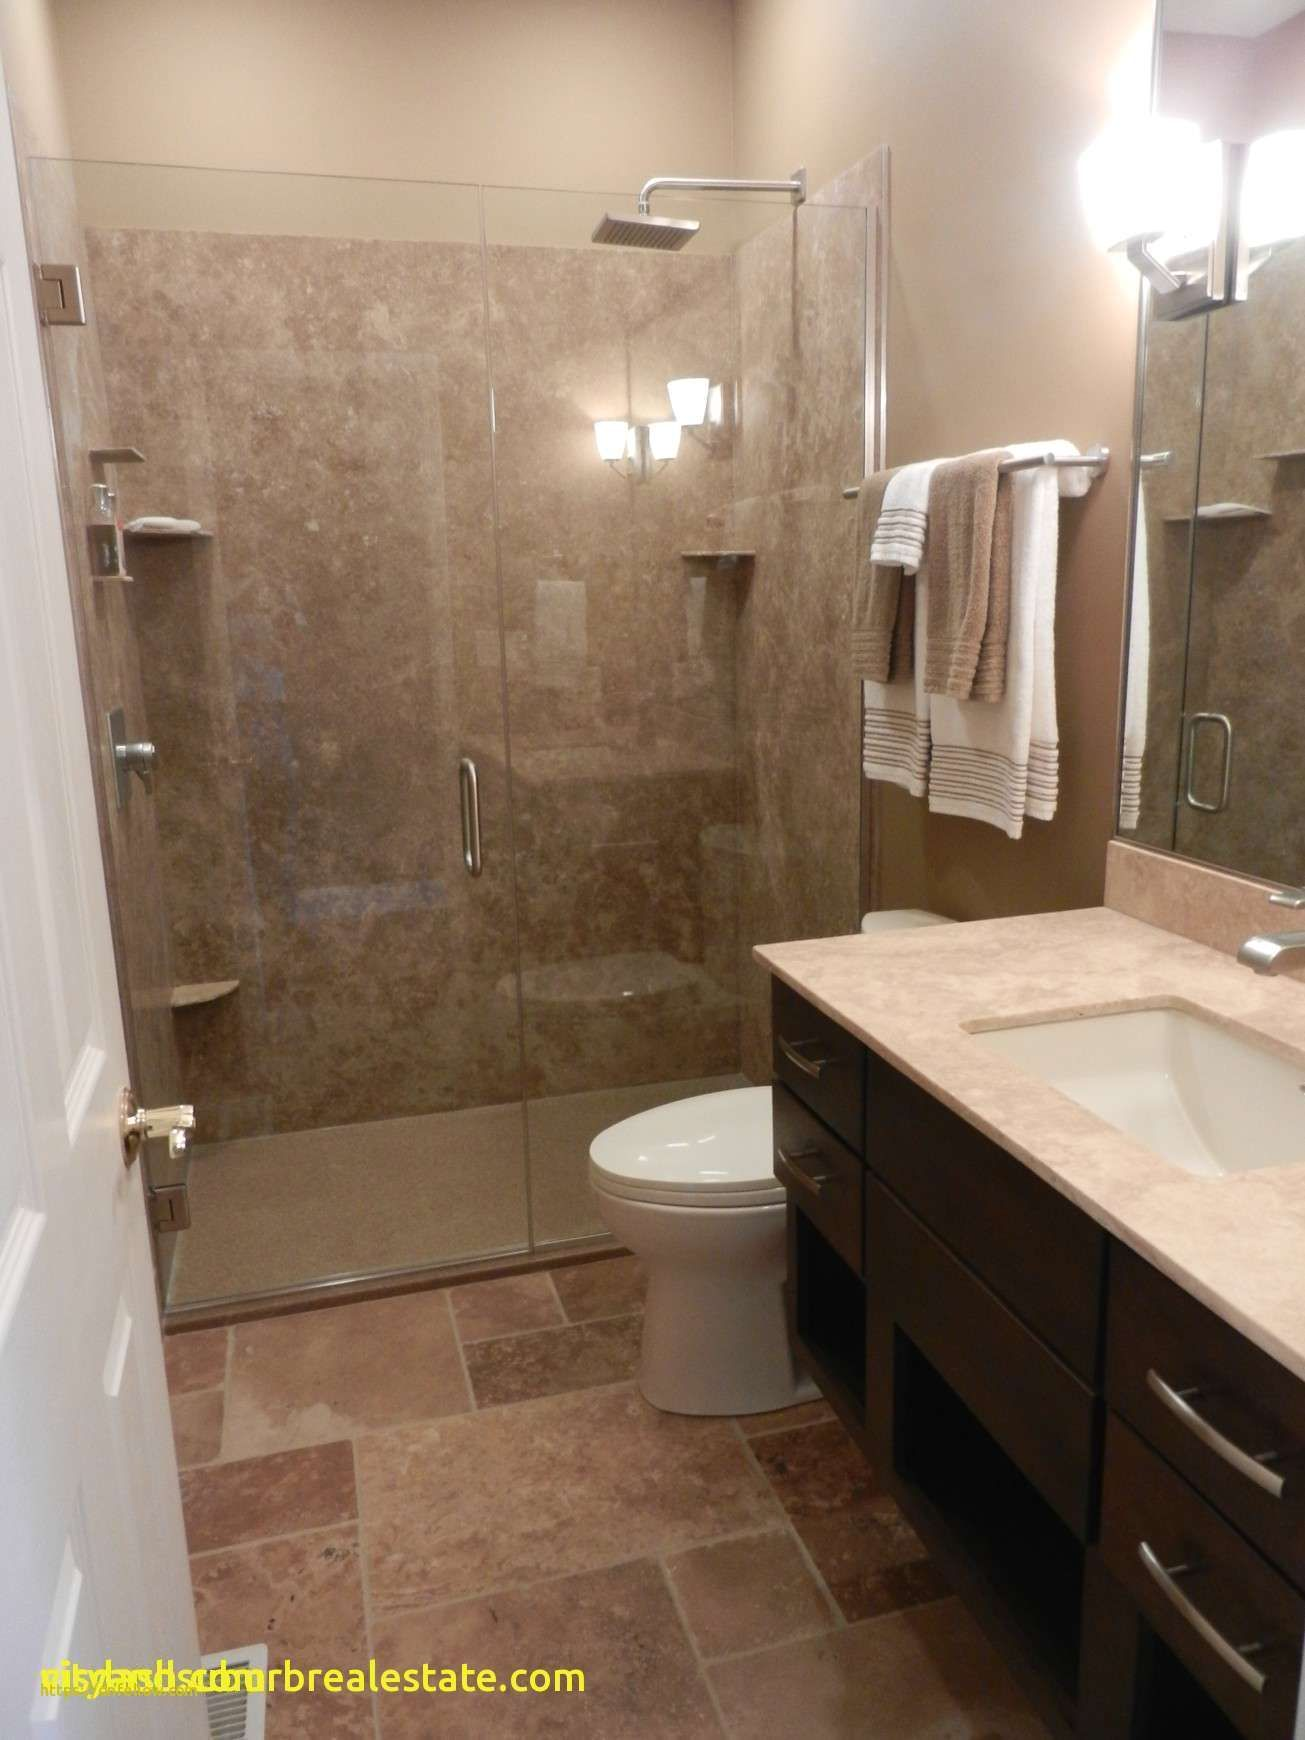 Fresh 4 X 9 Bathroom Design Fresh 4 X 9 Bathroom Design